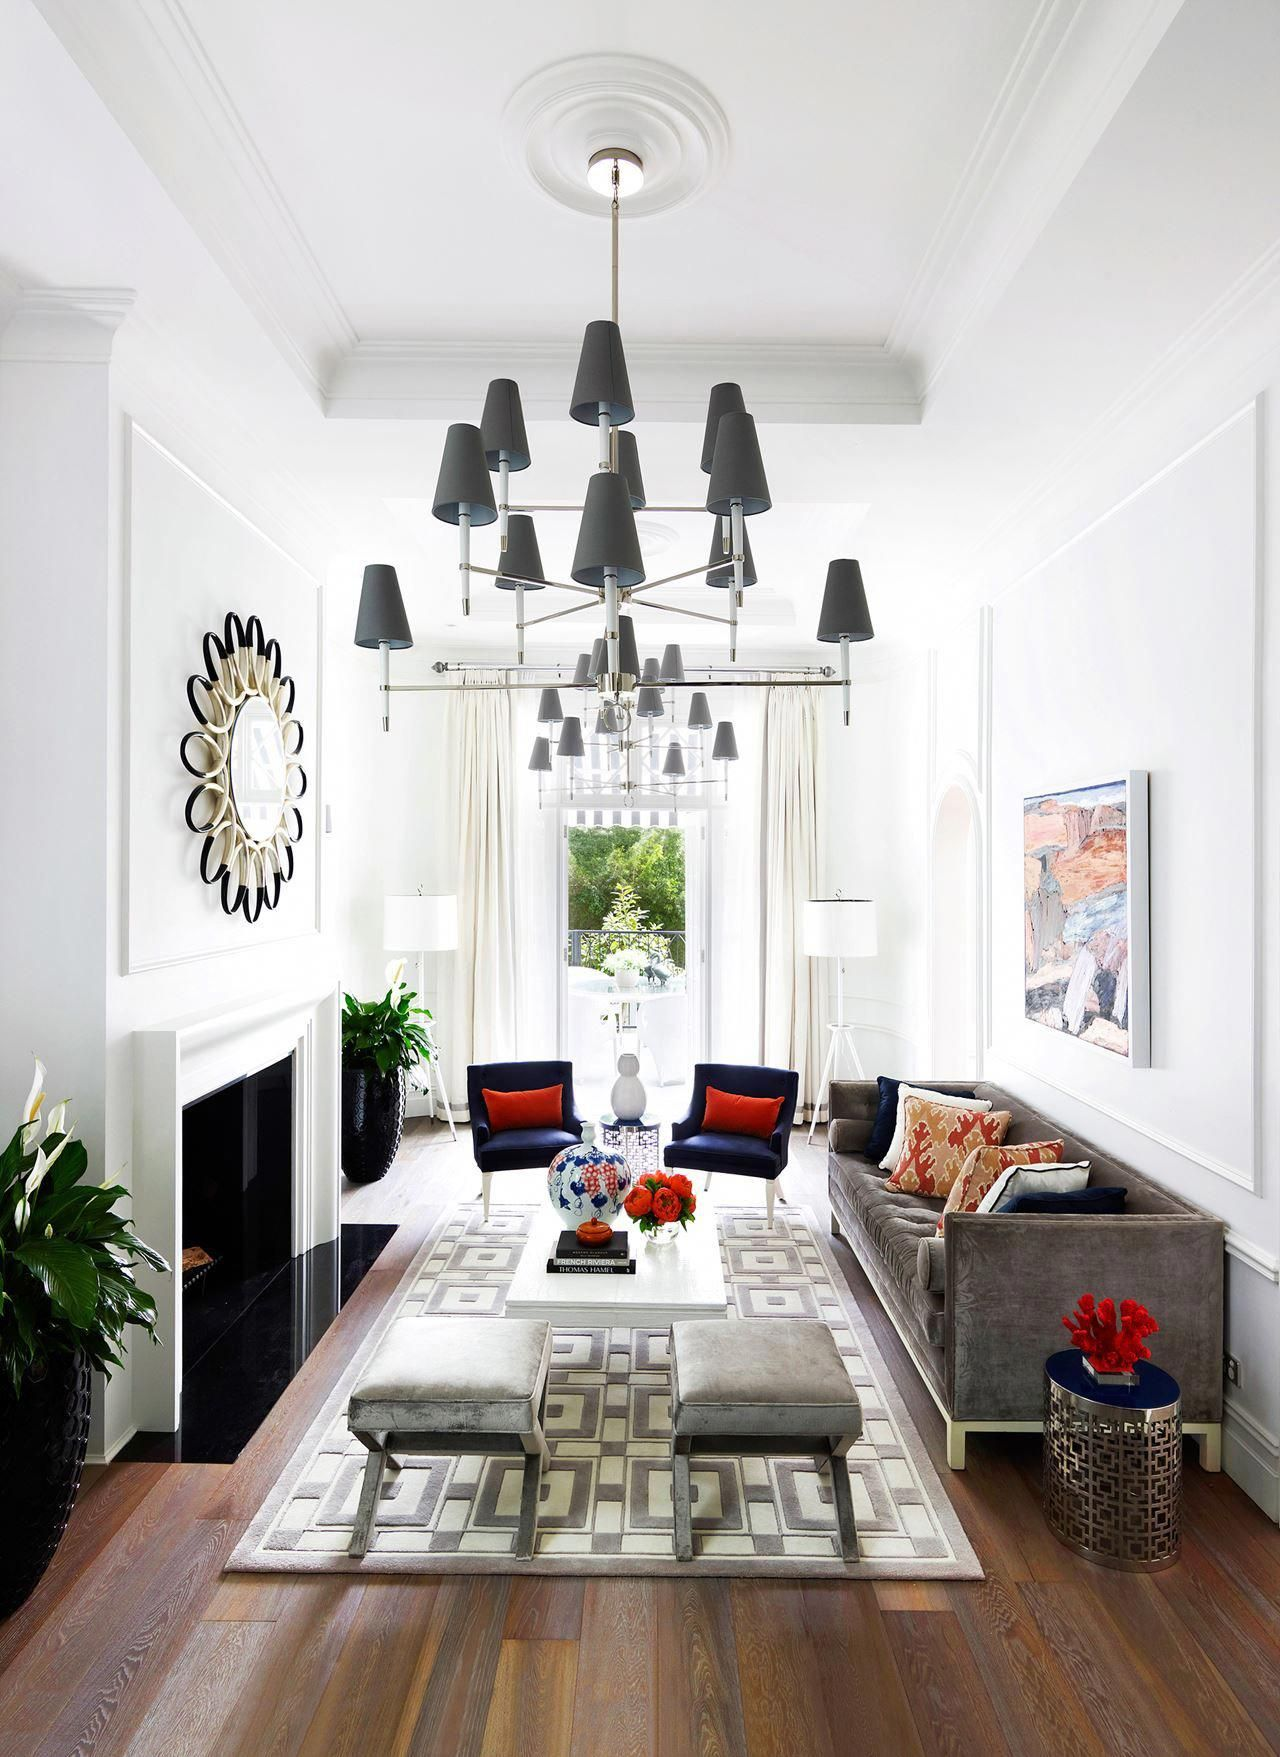 Living Room Decor Ideas | Front Room Designs | Living Room ...